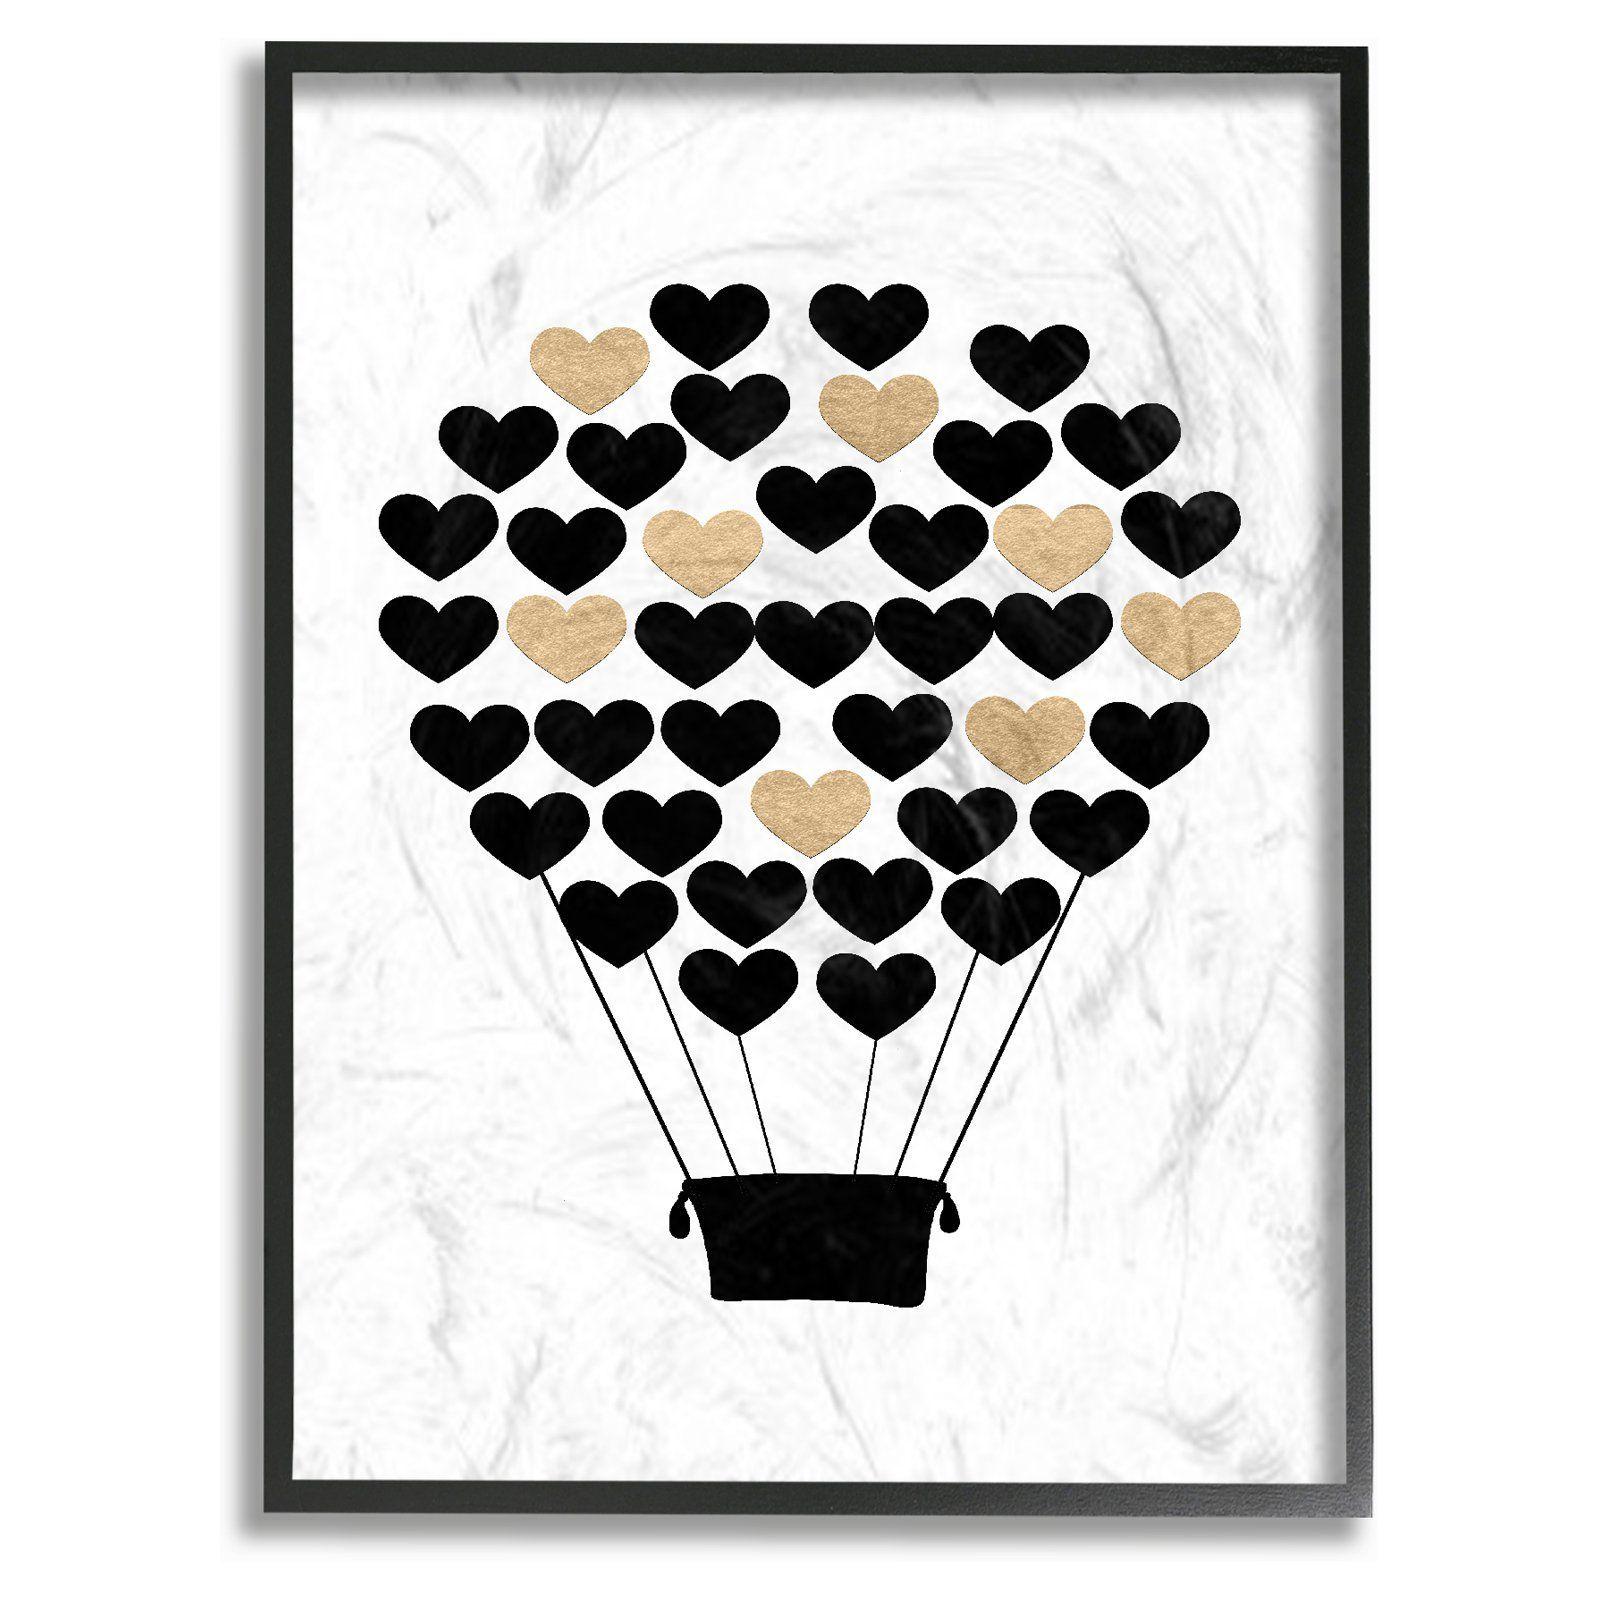 Stupell decor black and gold heart hot air balloon framed giclee